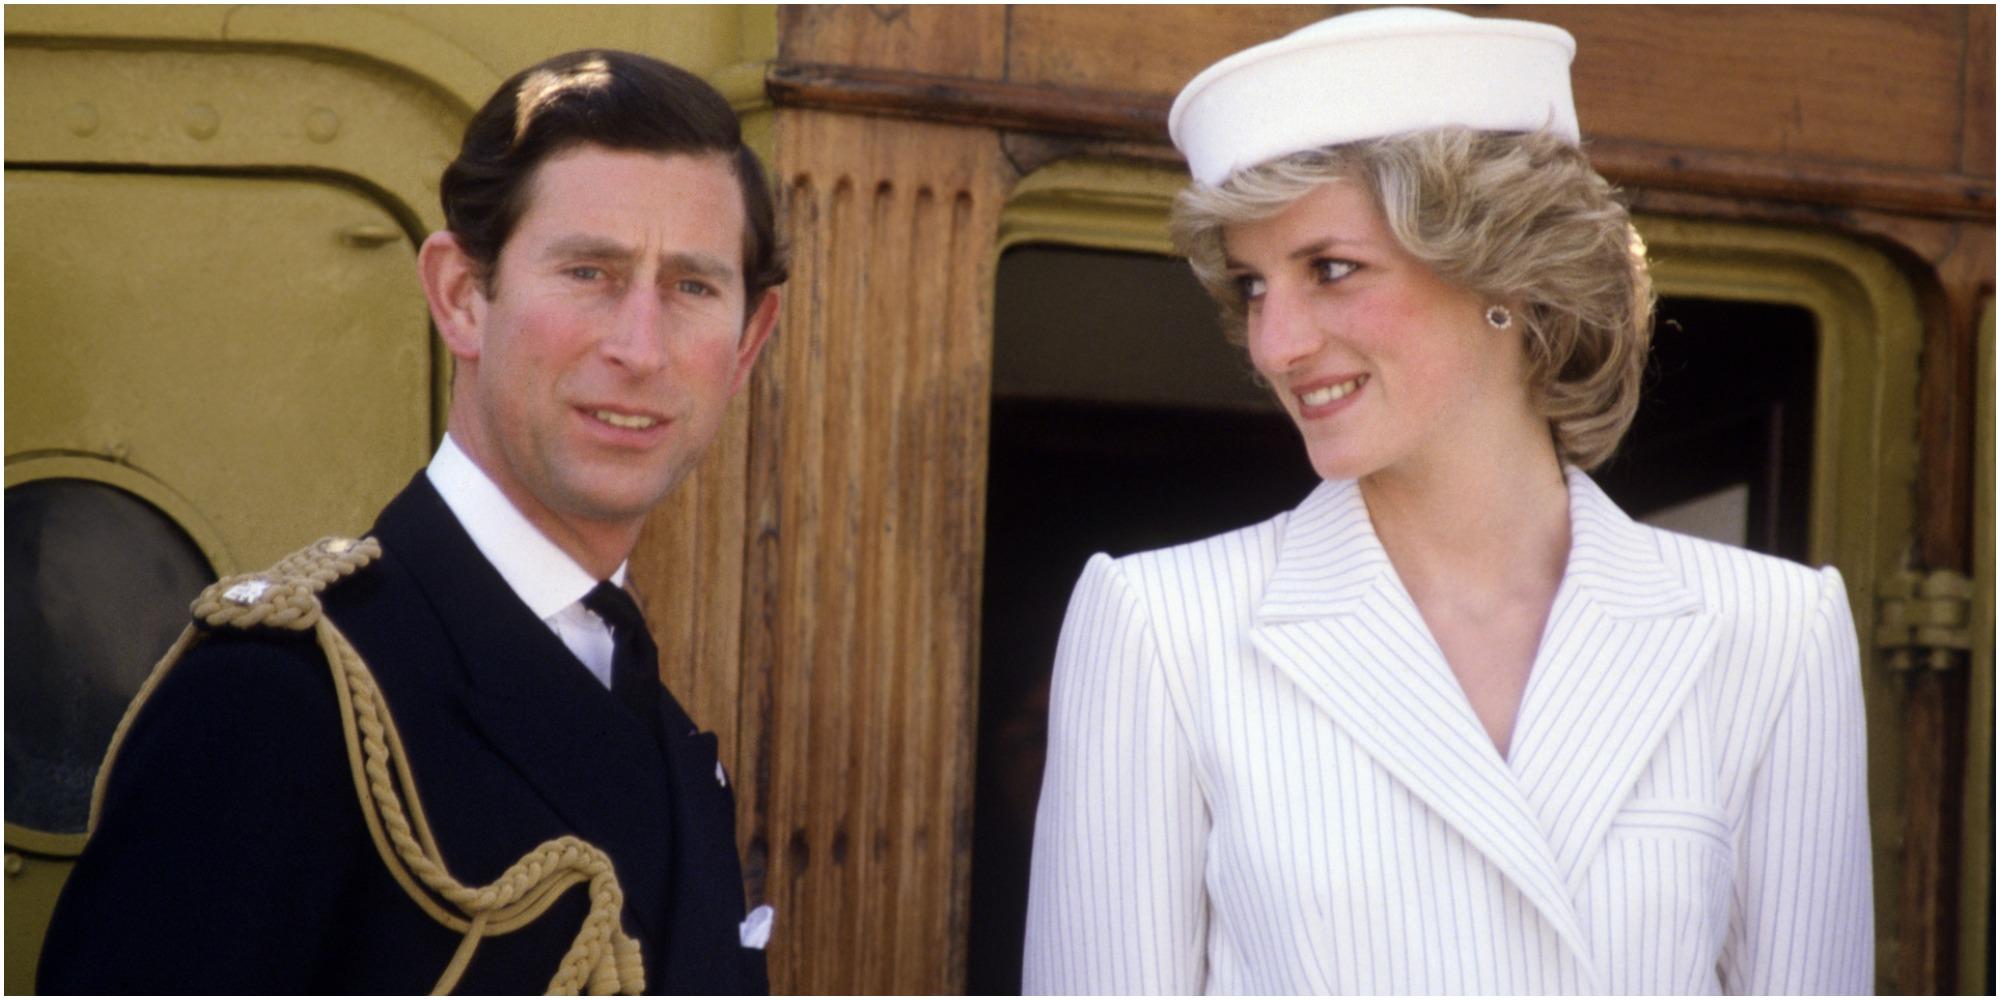 Prince Charles and Princess Diana pose for a photograph.